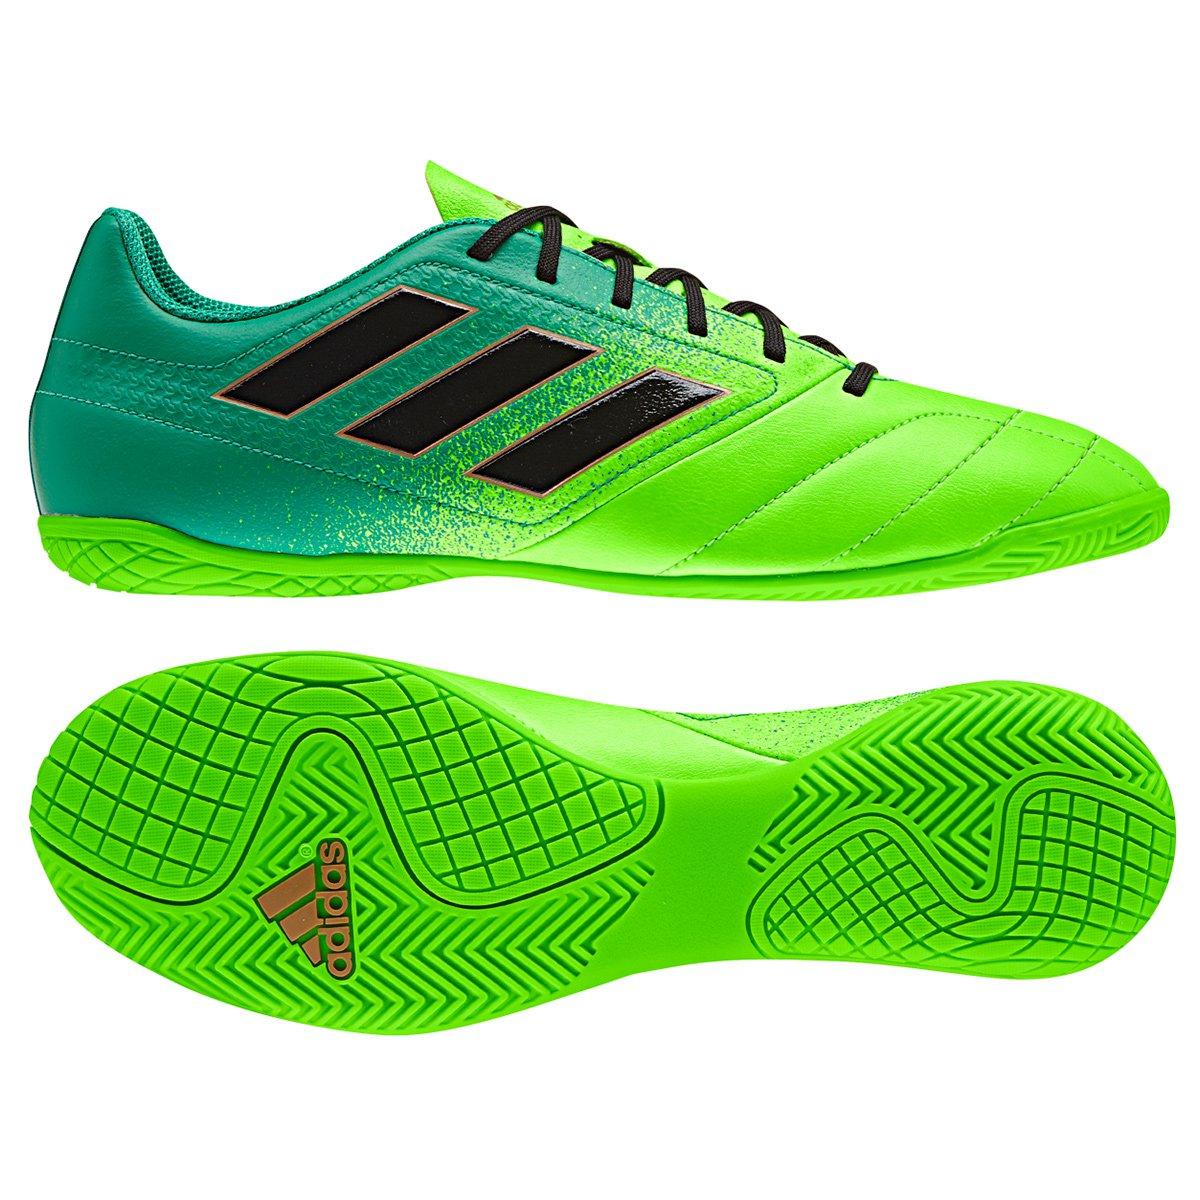 Chuteira Futsal Adidas Ace 17.4 IN - Verde e Preto - Compre Agora ... 66fb745ab1c34